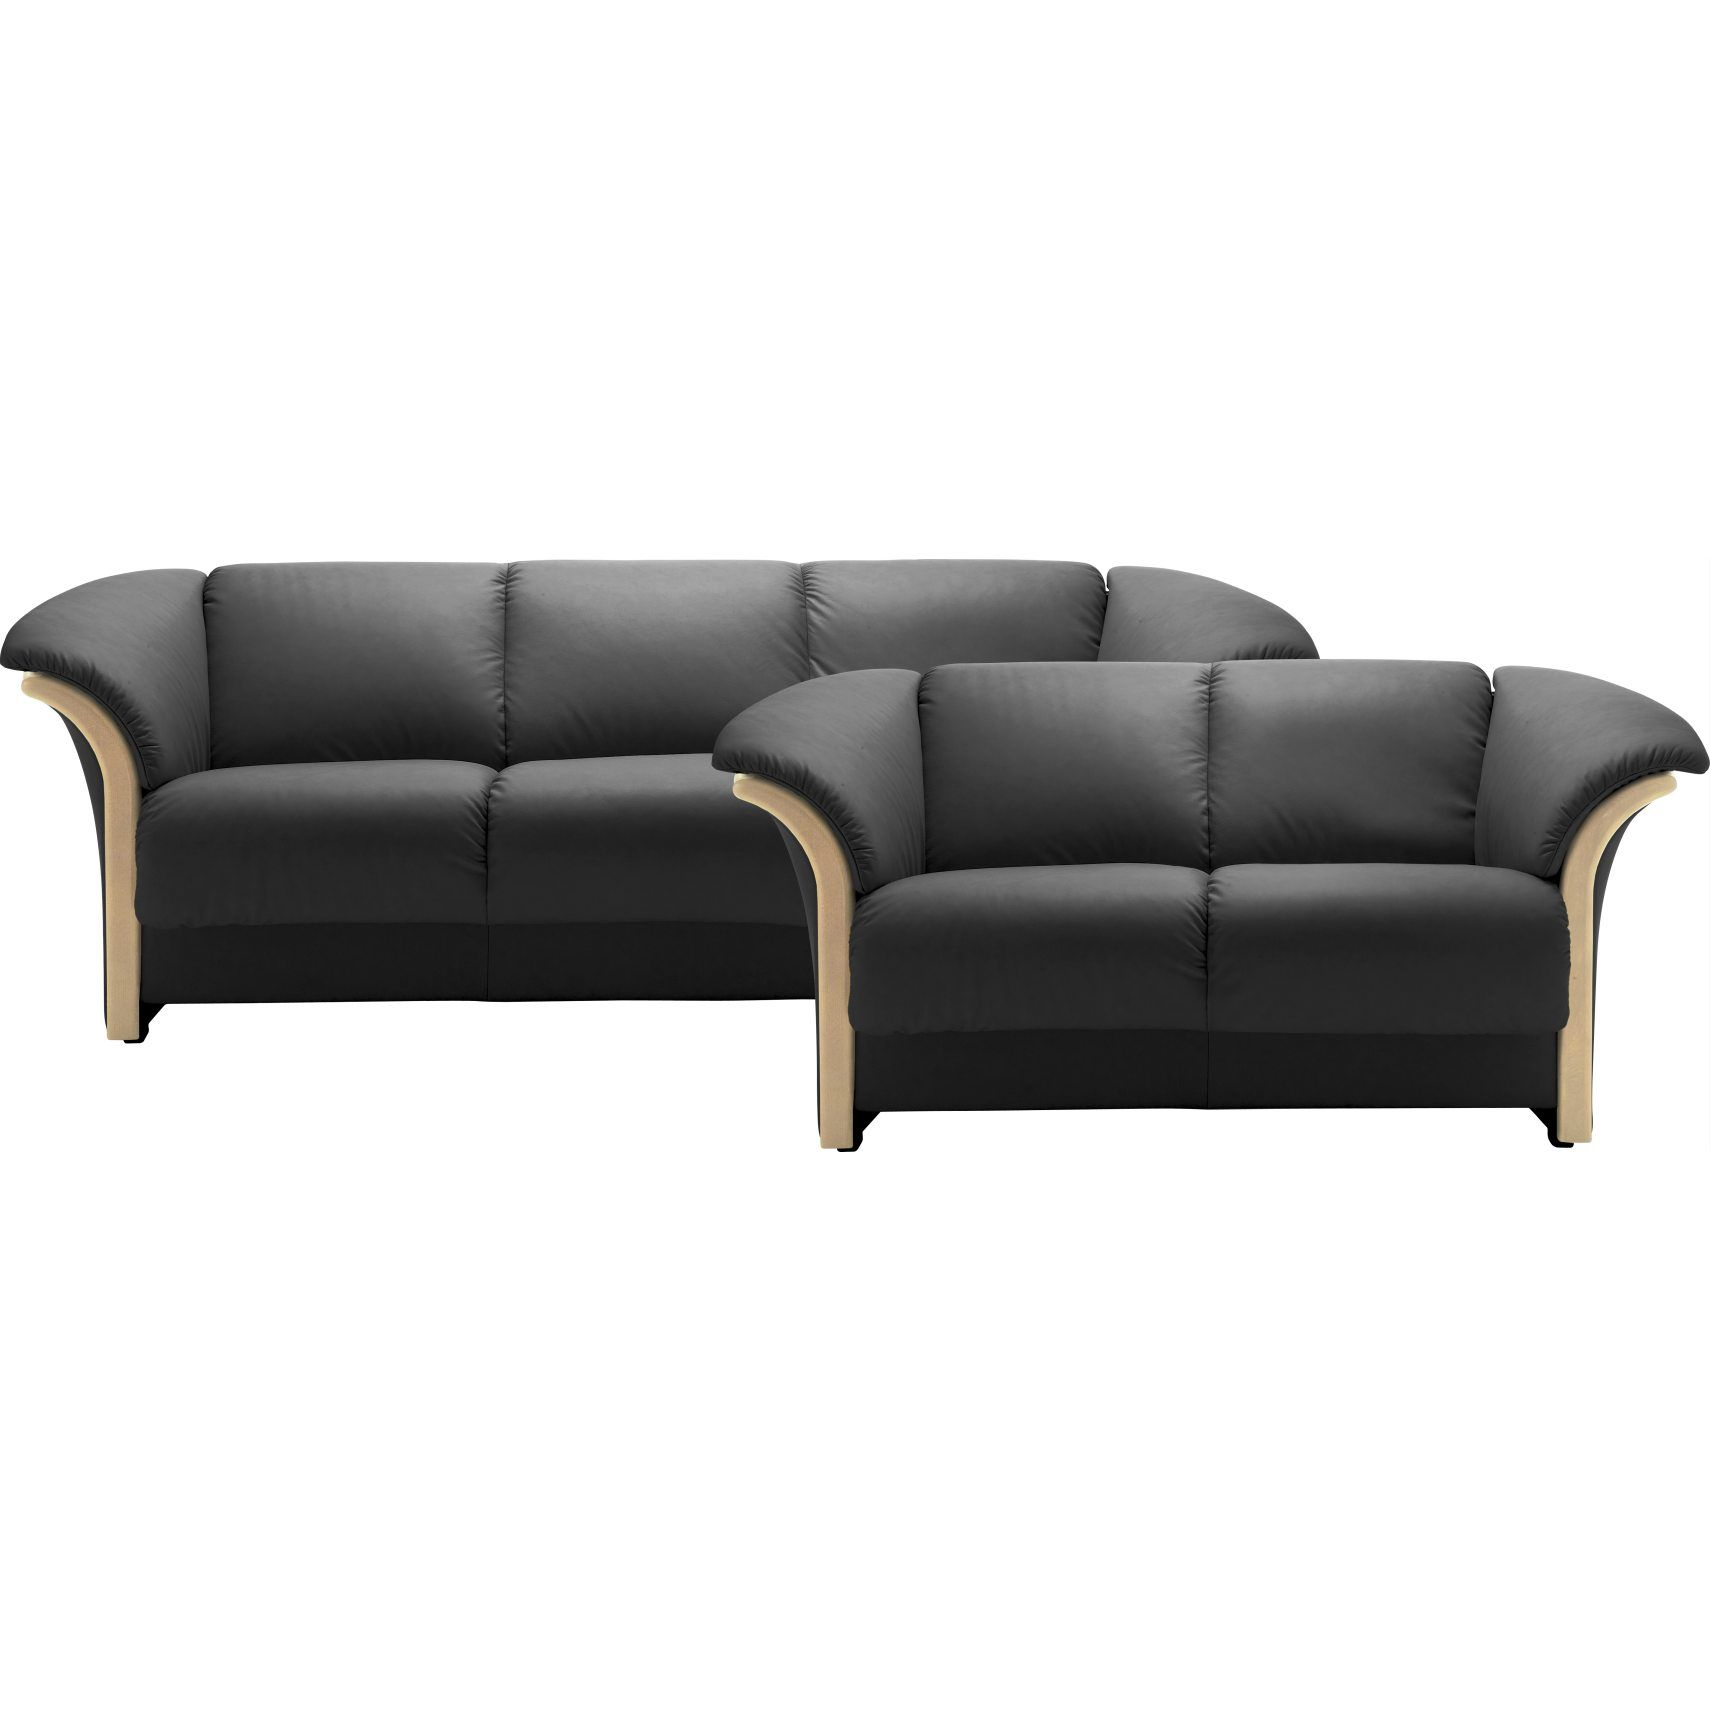 Ekornes Manhattan Sofa Ekornes Manhattan Leather Ergonomic Sofa Couch Loveseat And Chair Thesofa